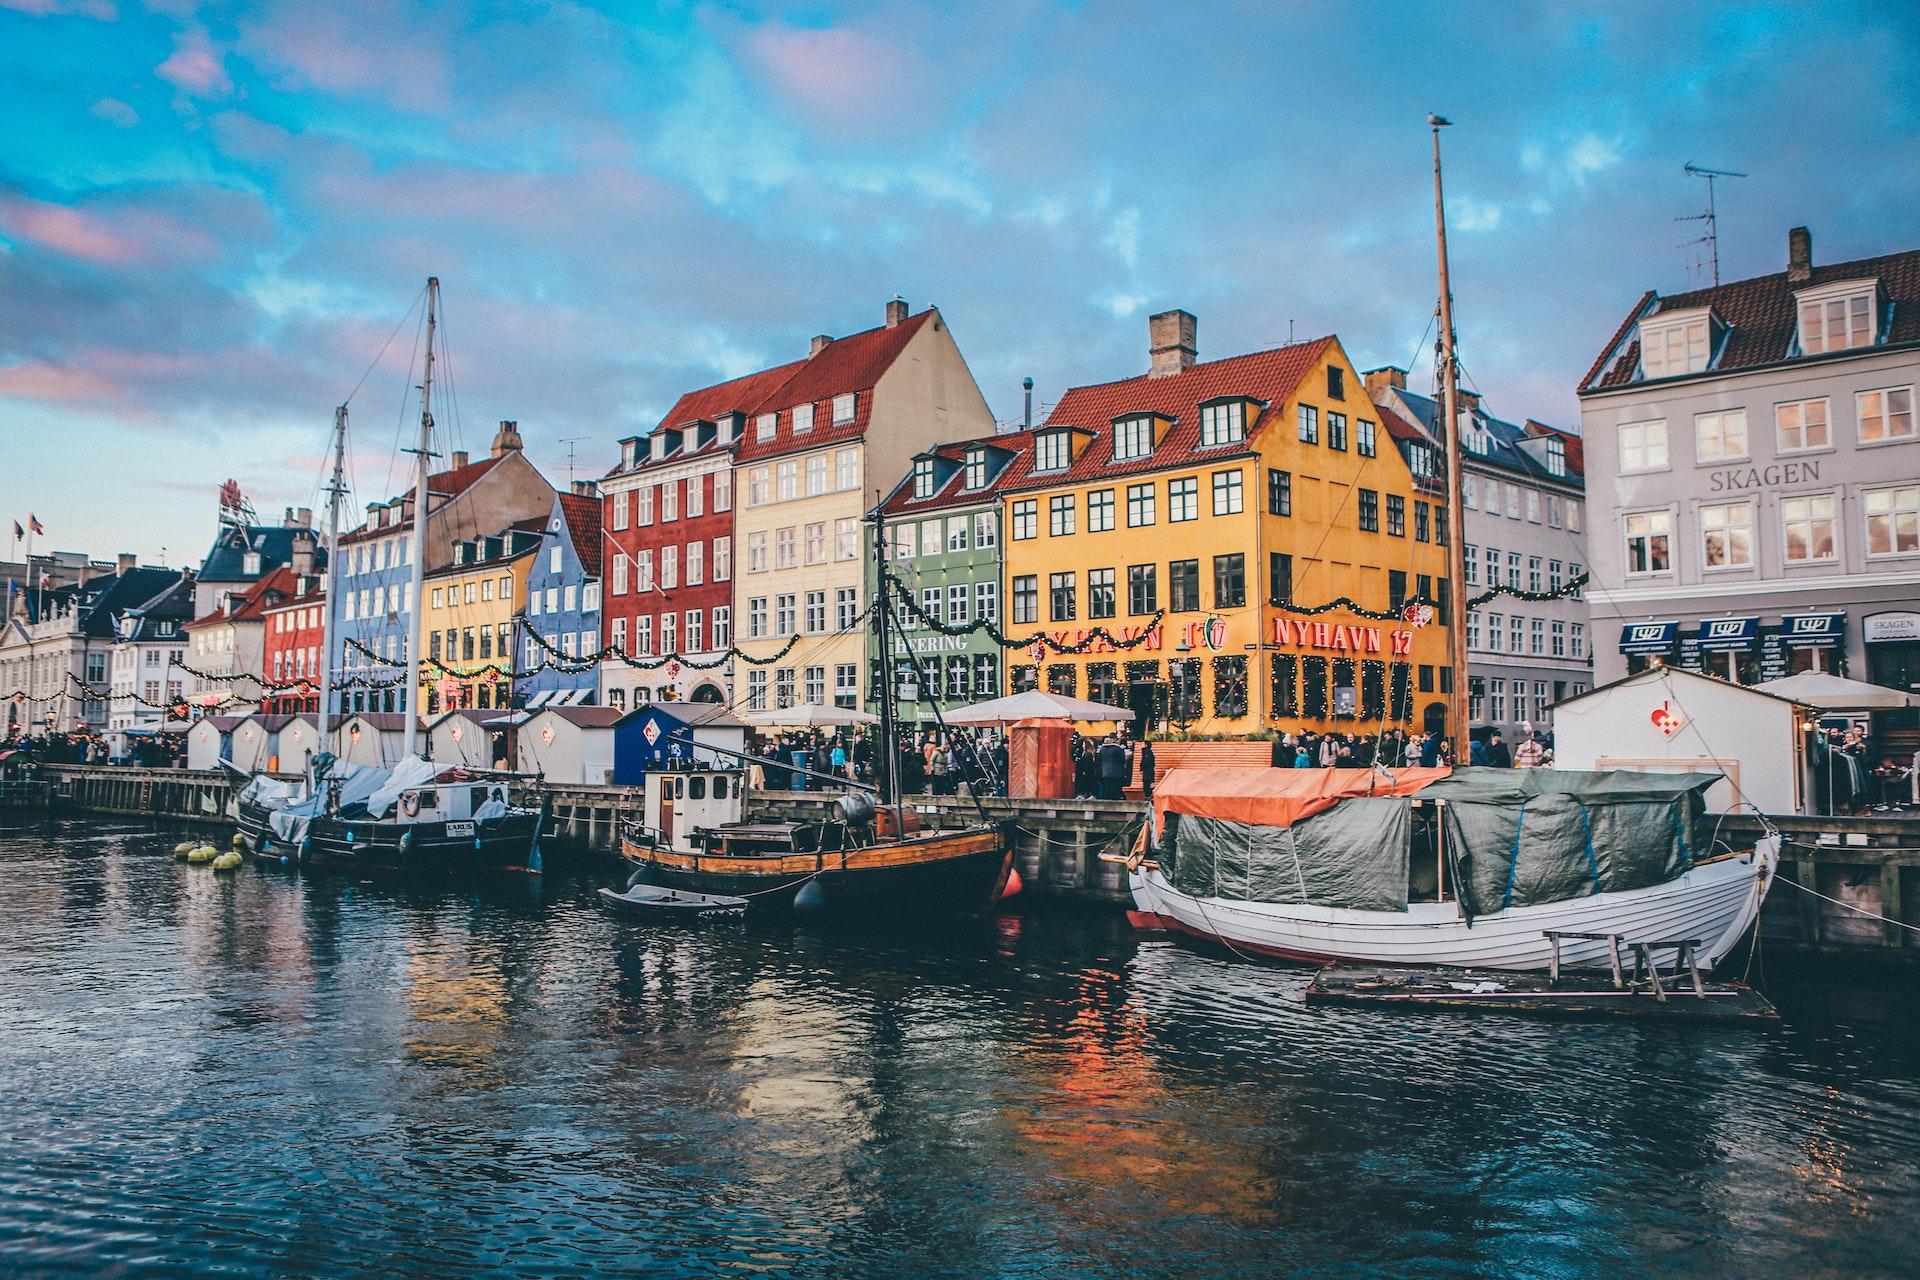 Photo: Nyhavn, København, Denmark | Credit: Nick Karvounis, YFS Magazine, Unsplash